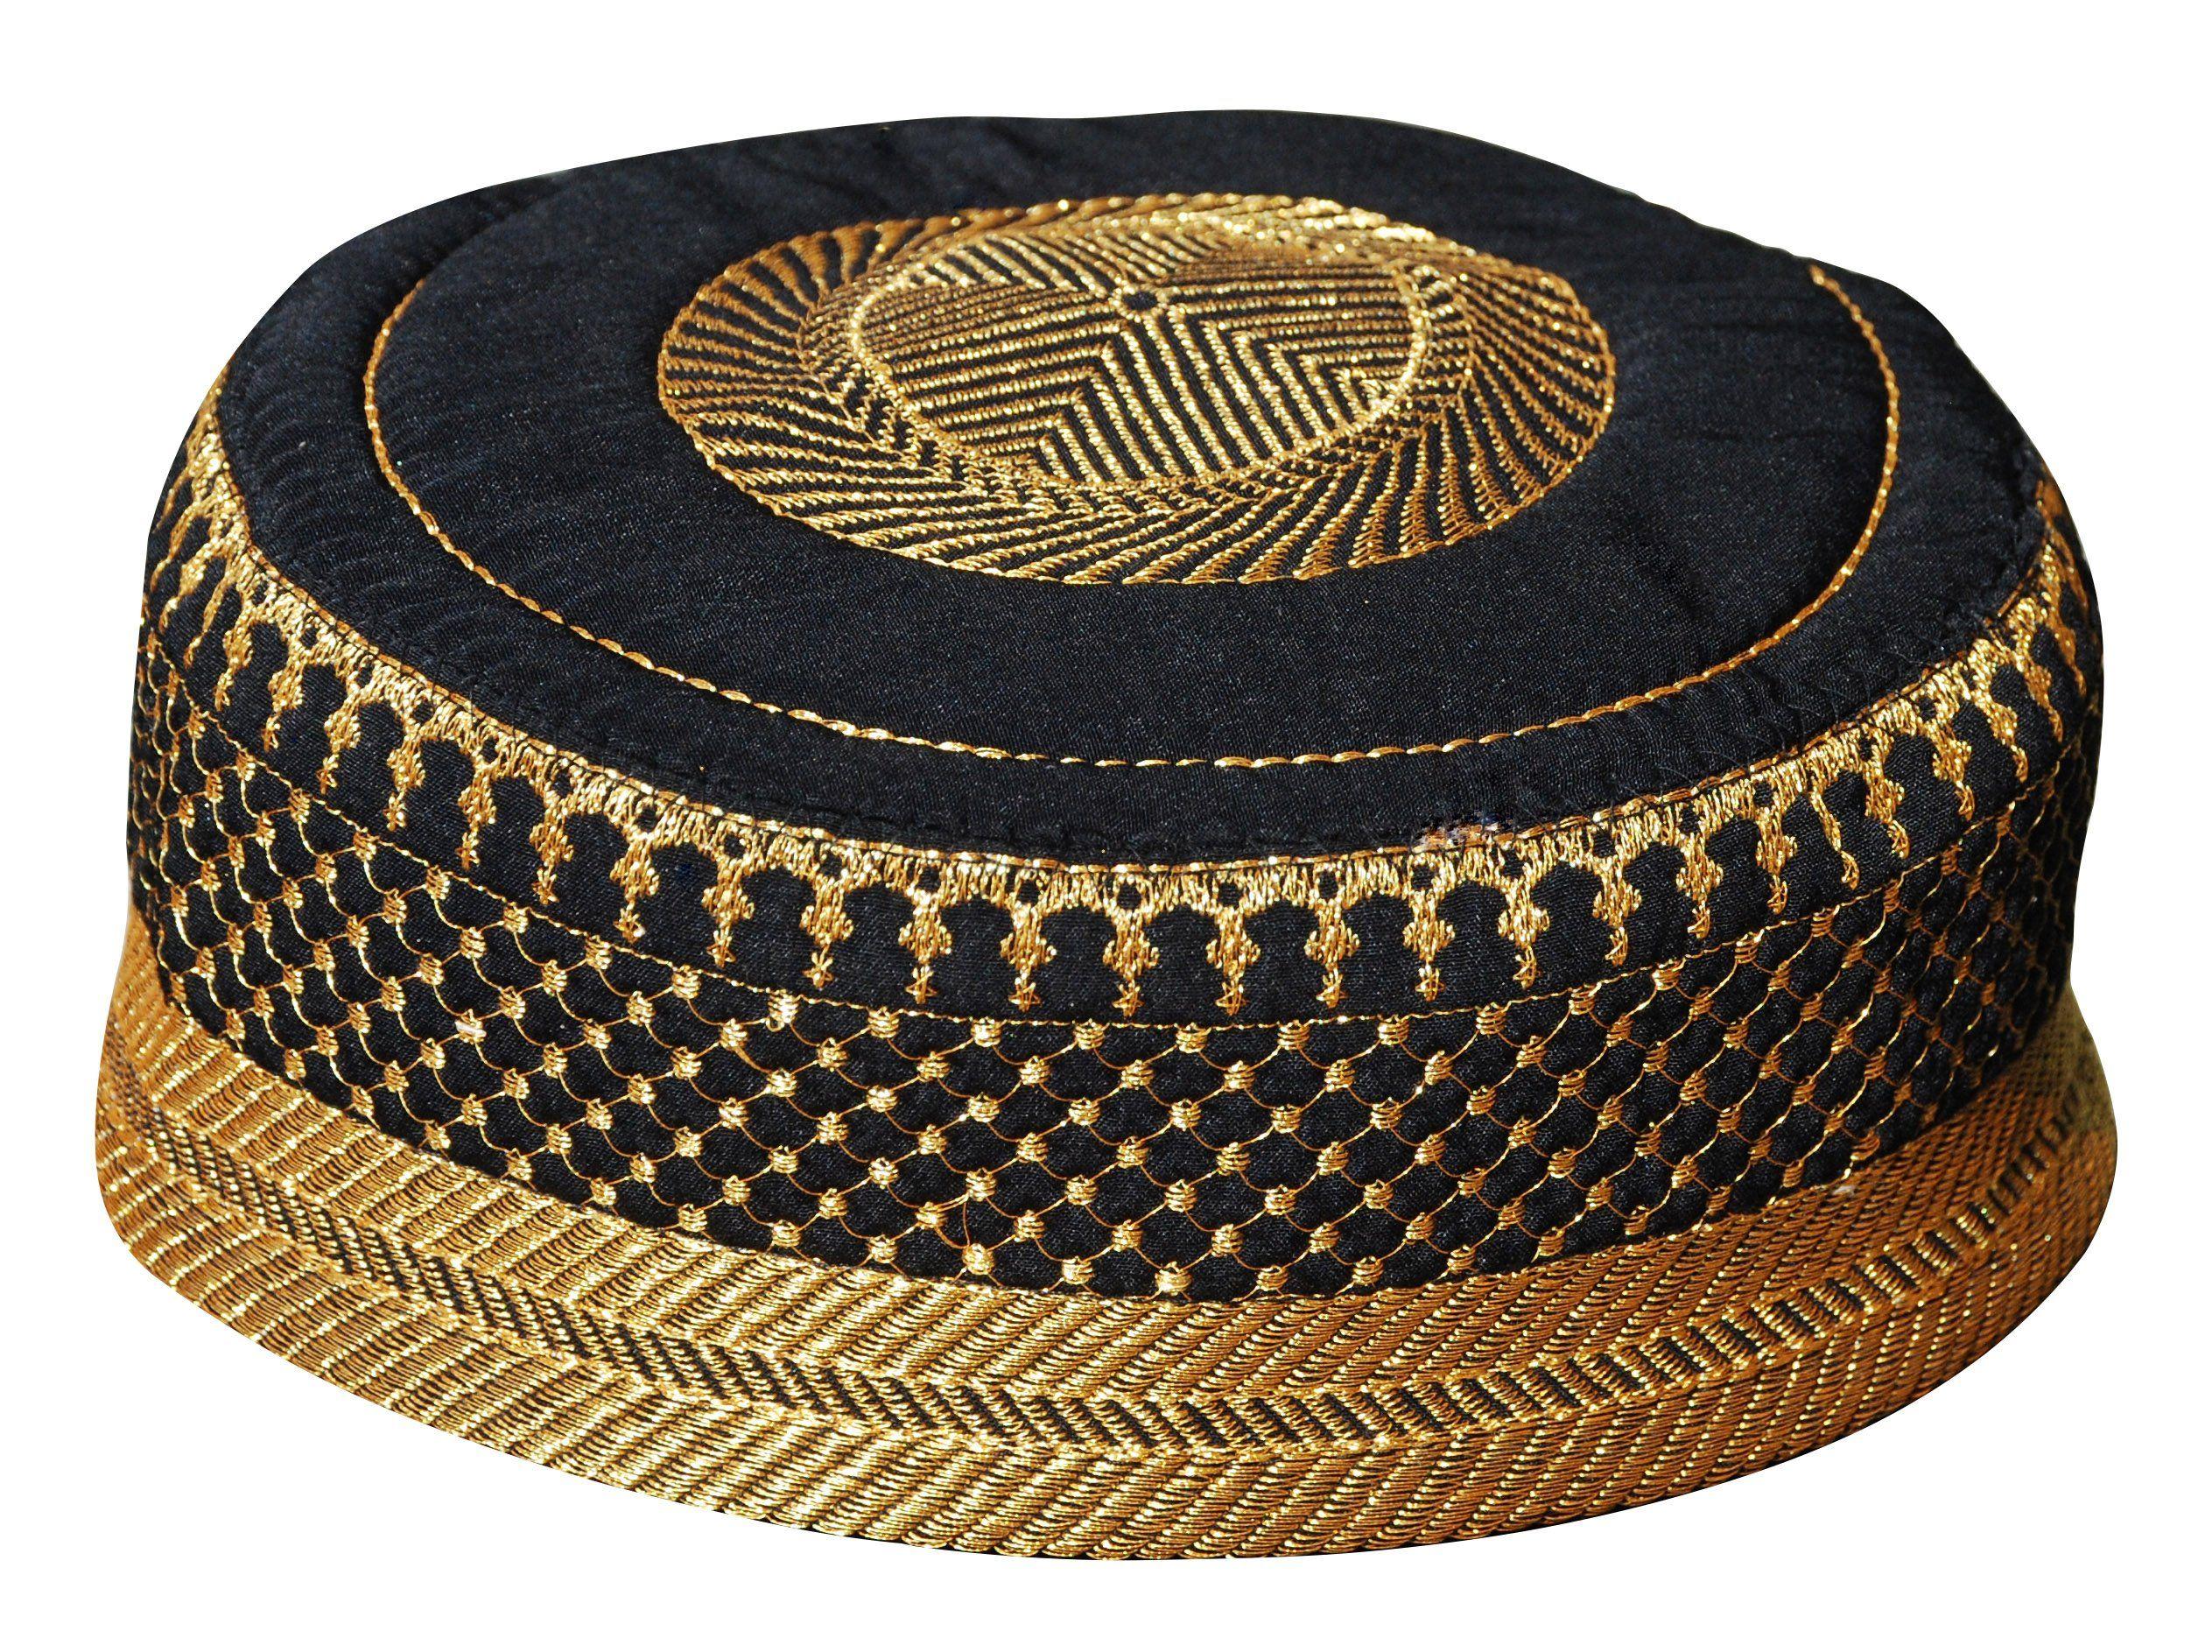 Robot Check Black Metallic African Hats Hats For Men